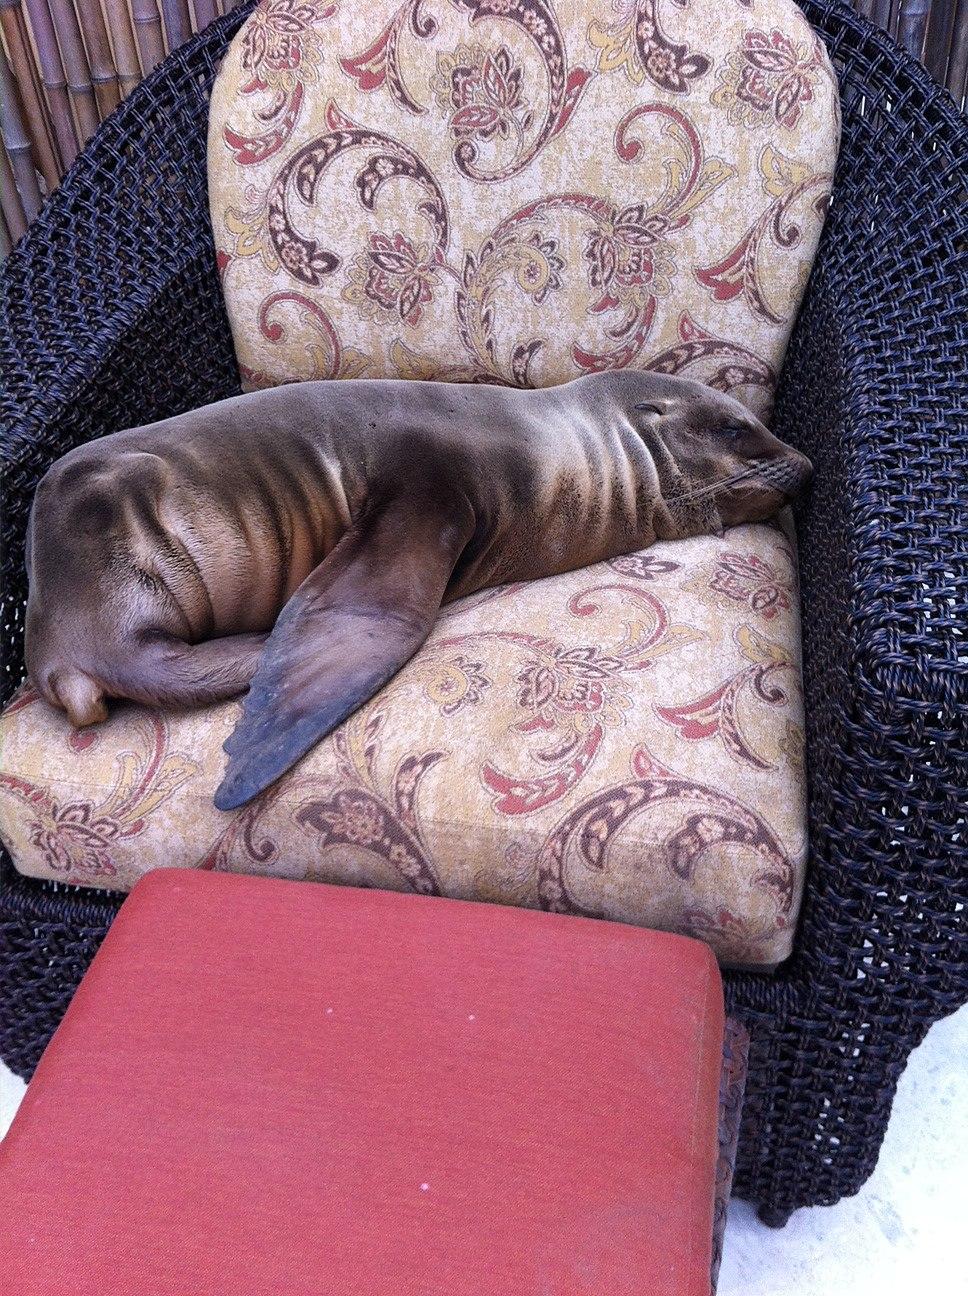 Sea Lion Lounging